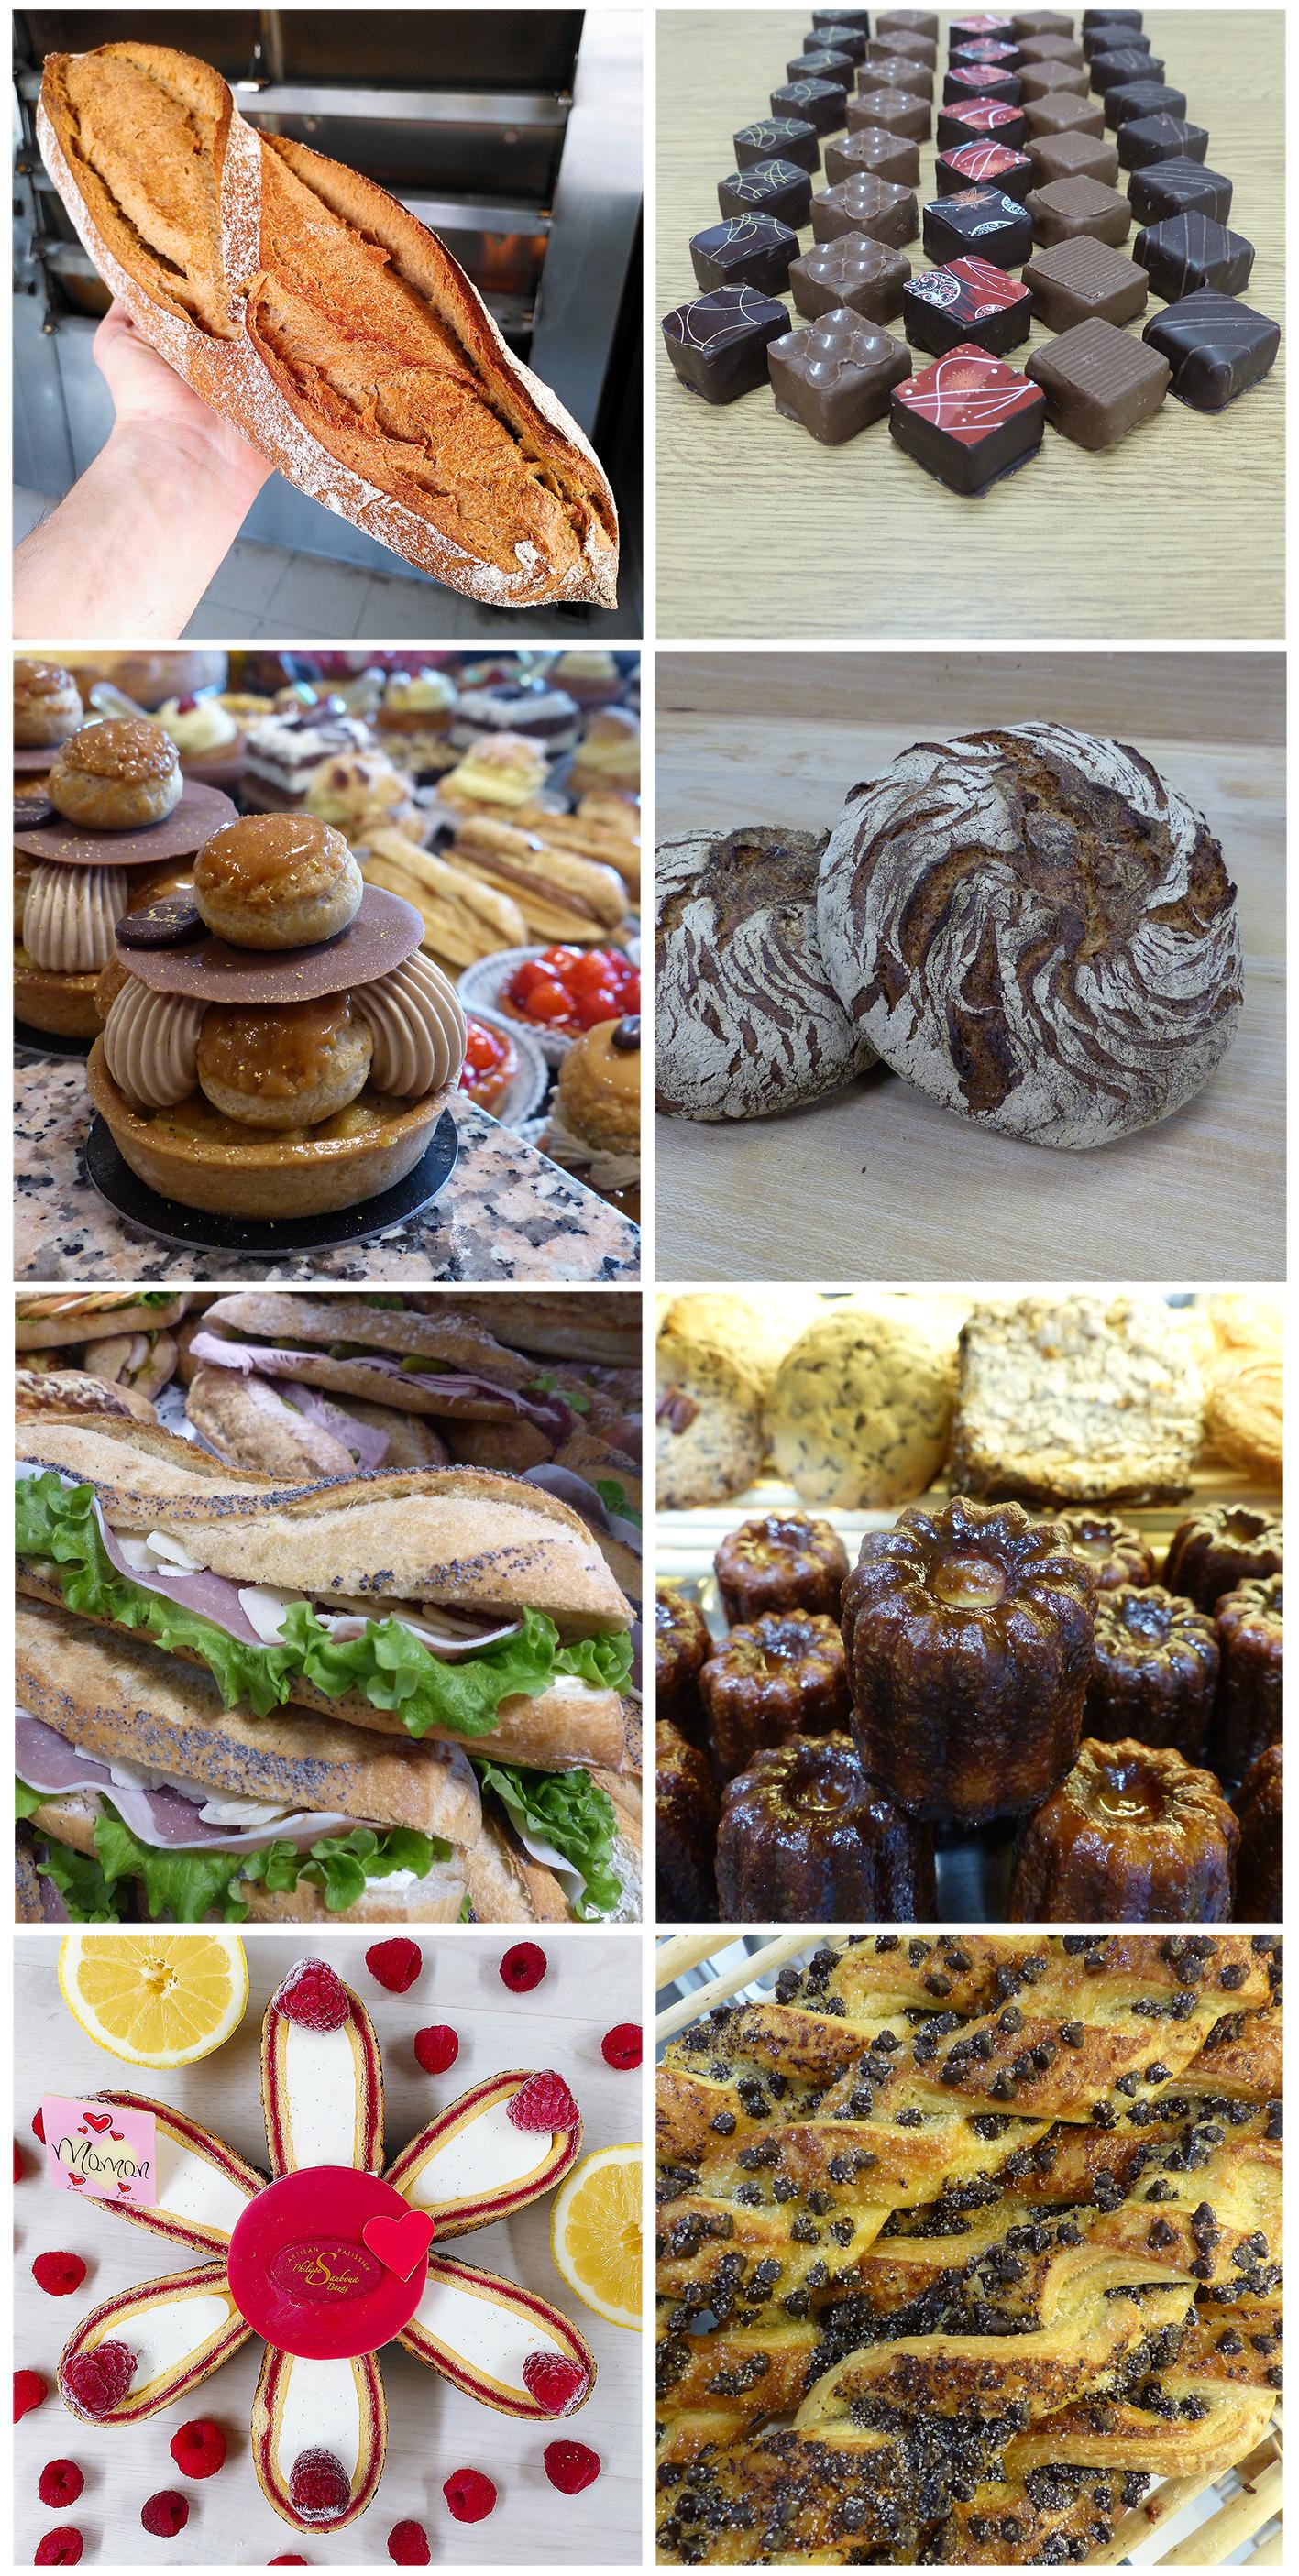 Photo-accueil Boulangerie SAUBOUA